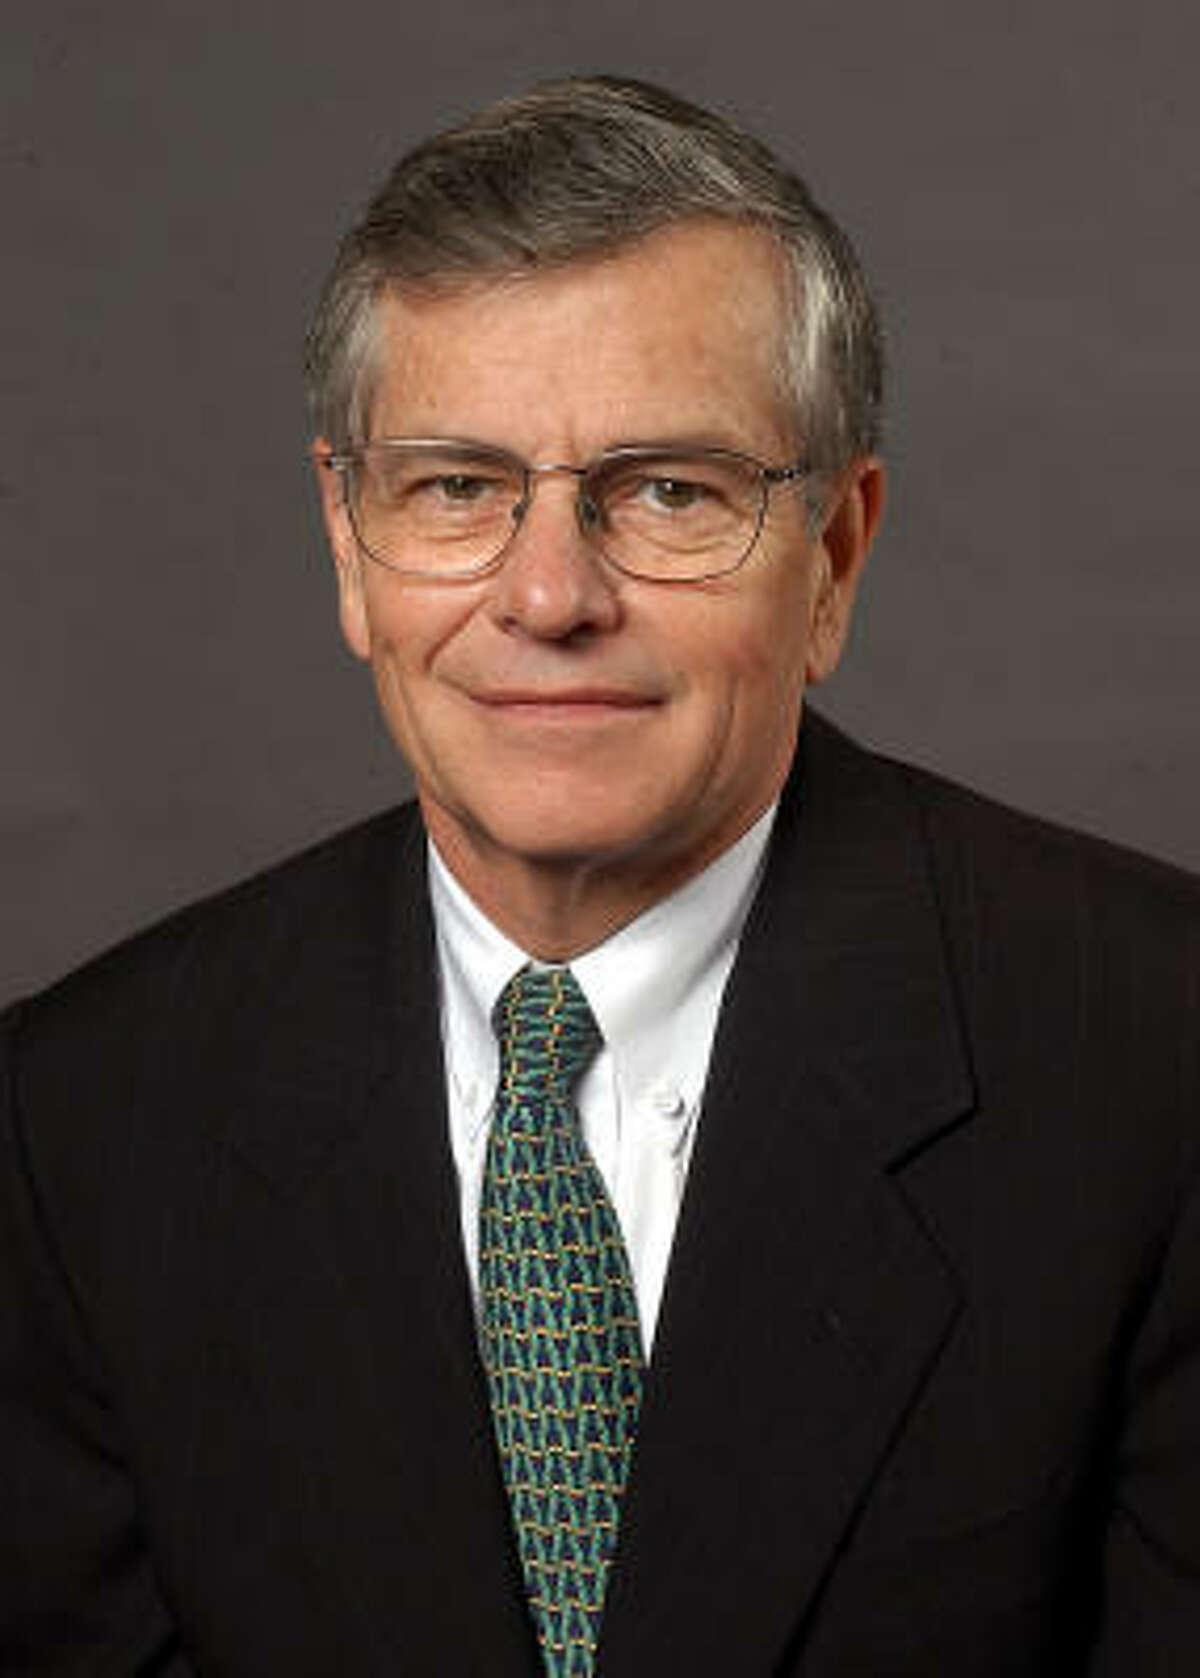 Rep. Tom Craddick, left, uses